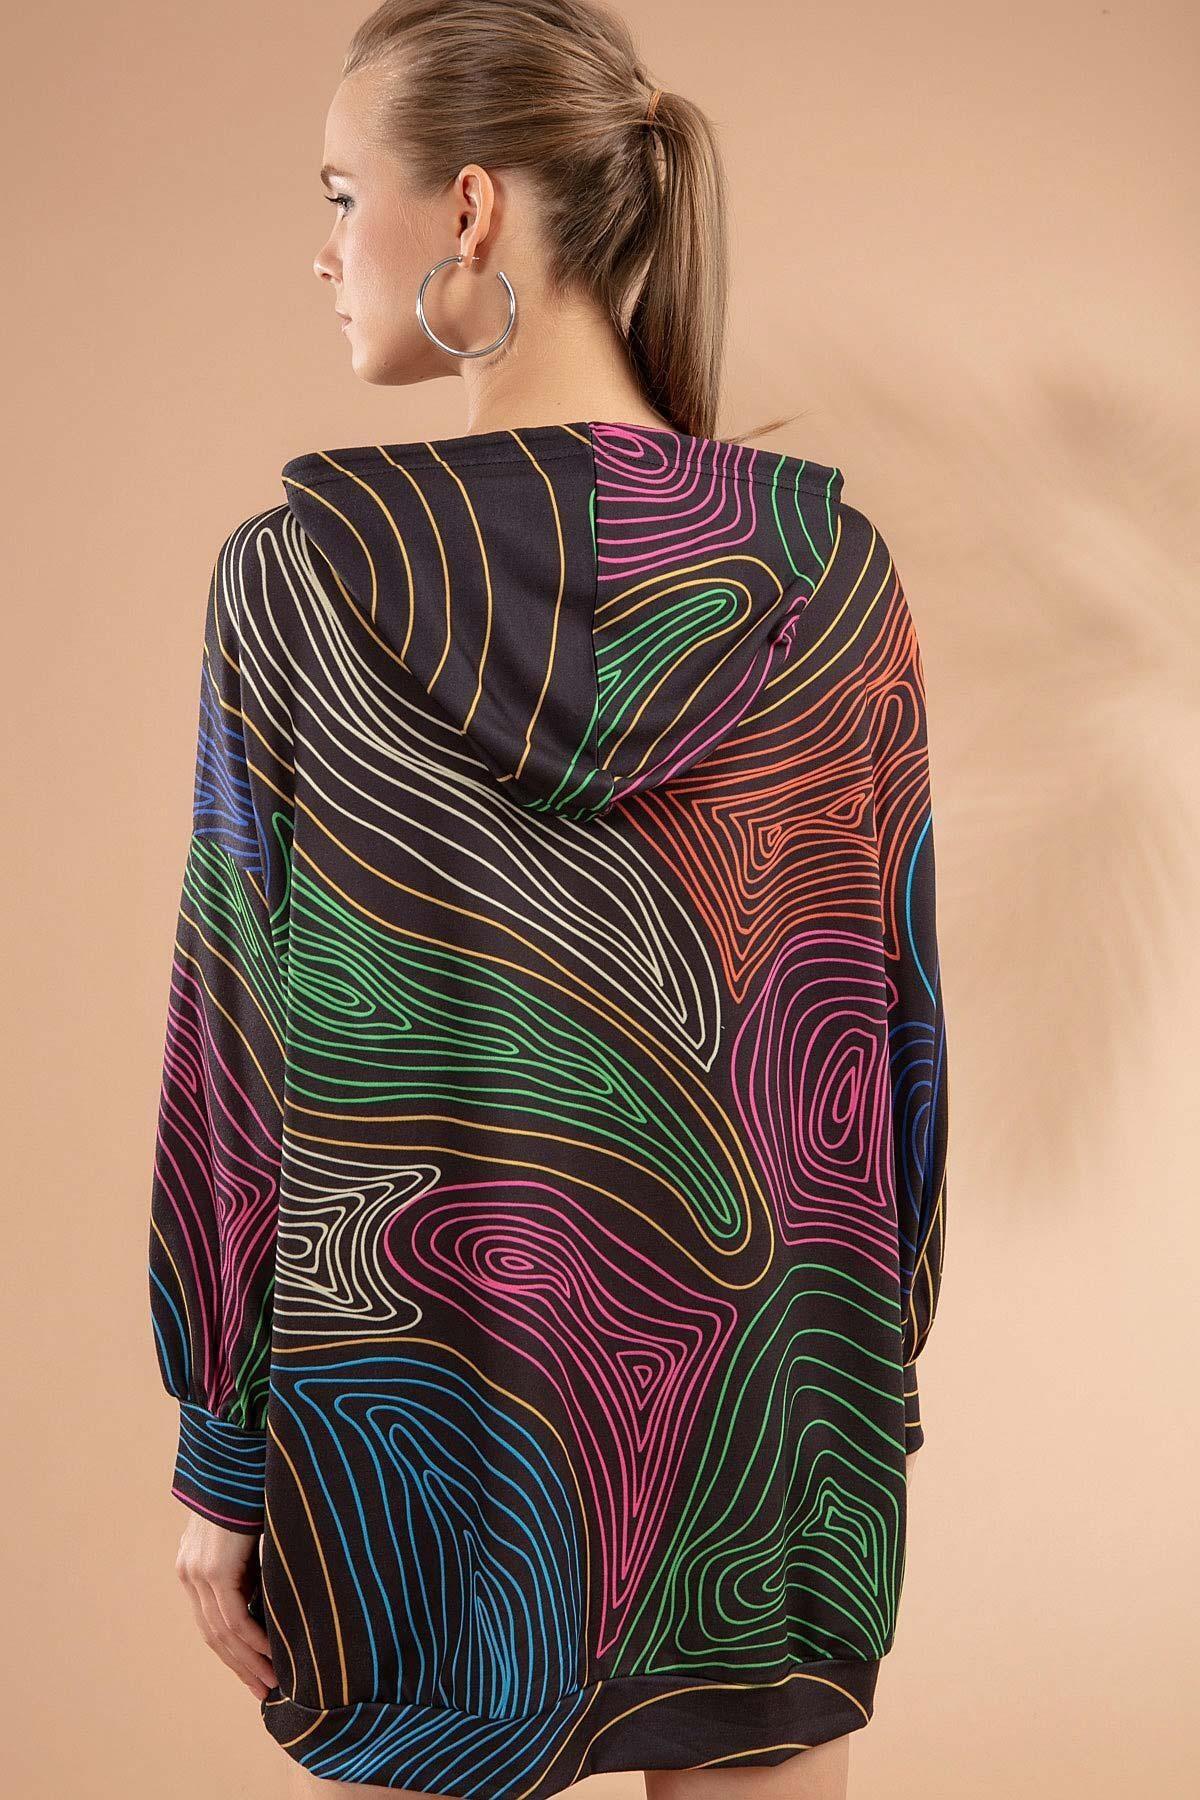 Pattaya Kadın Çizgili Kapşonlu Sweatshirt Elbise Y20w110-4125-18 4